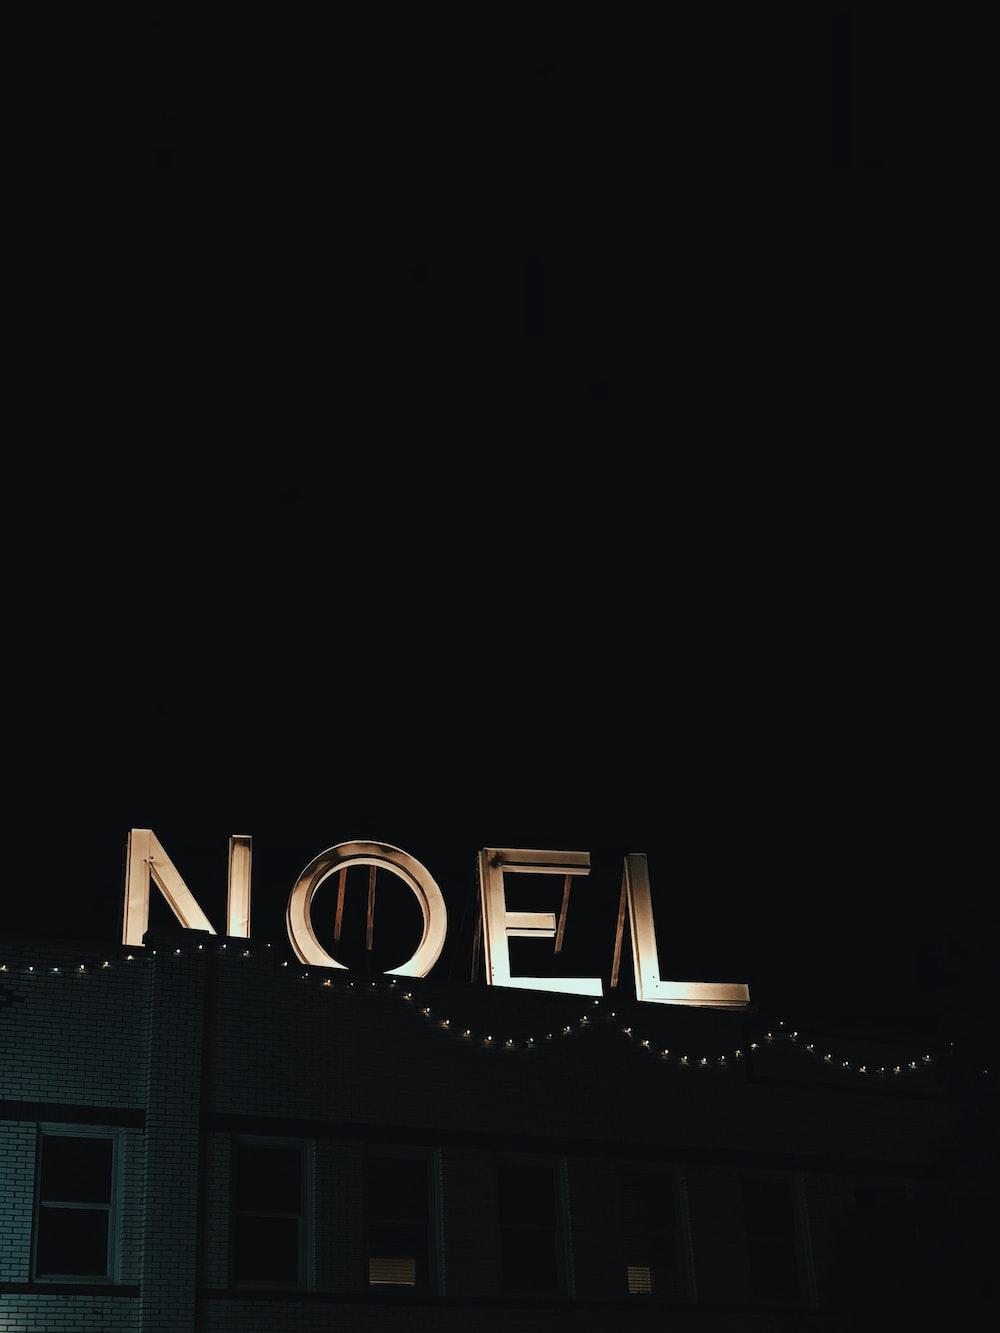 Noel neon light signage